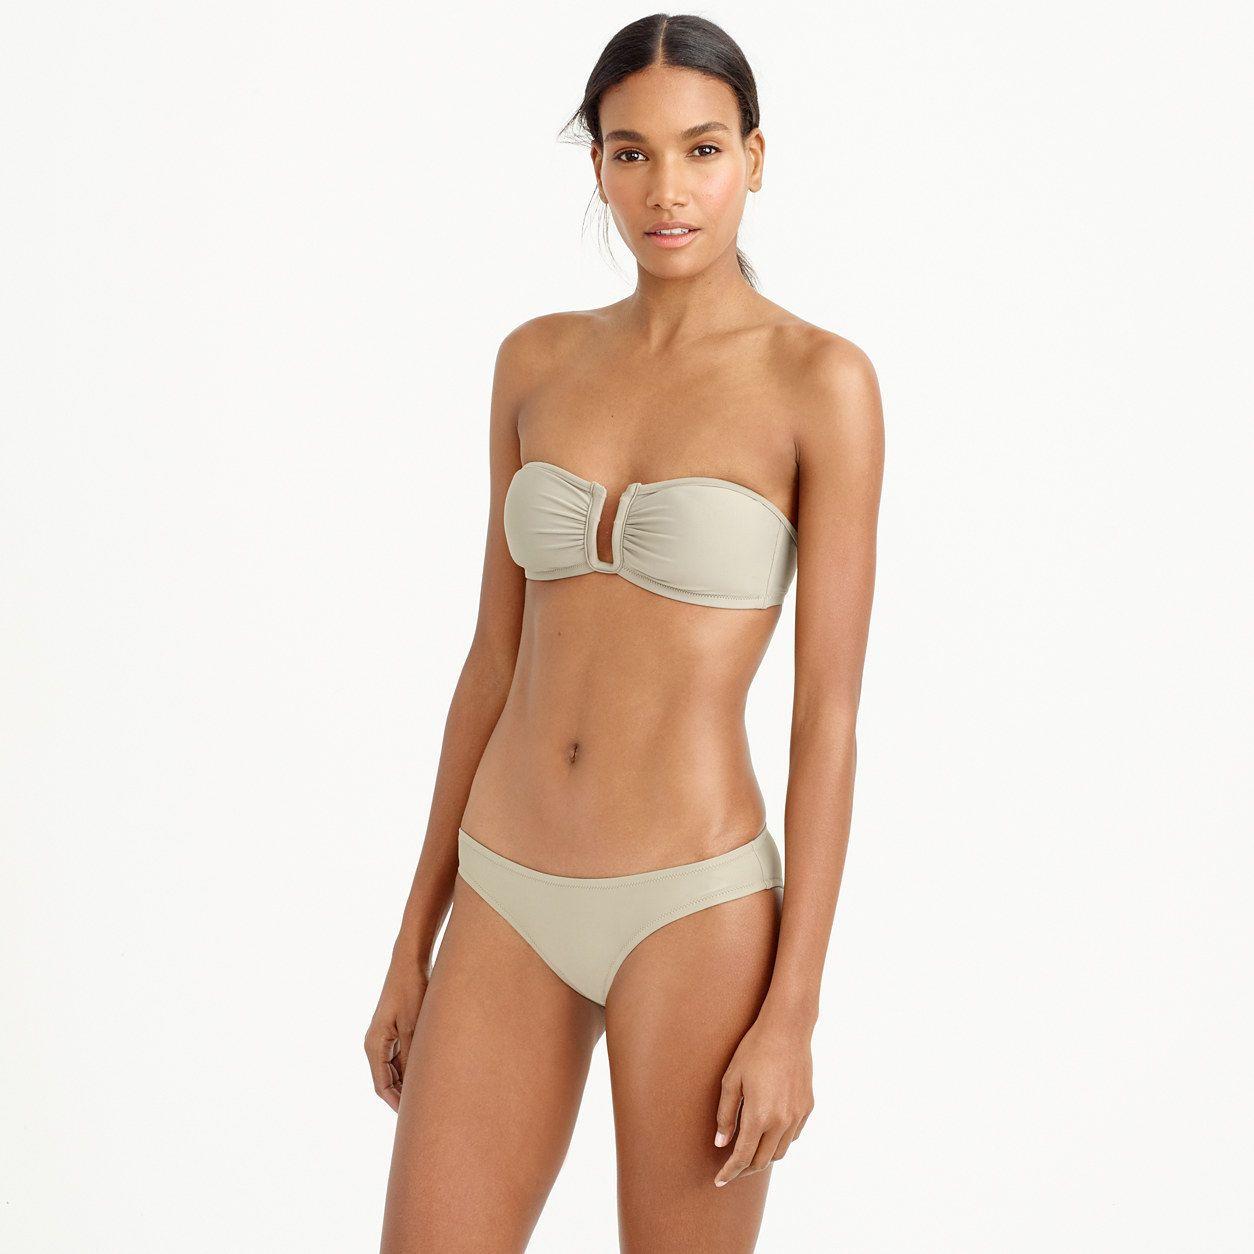 e47b296d1b27c J.Crew Womens U-Front Bandeau Bikini Top (Size XL)